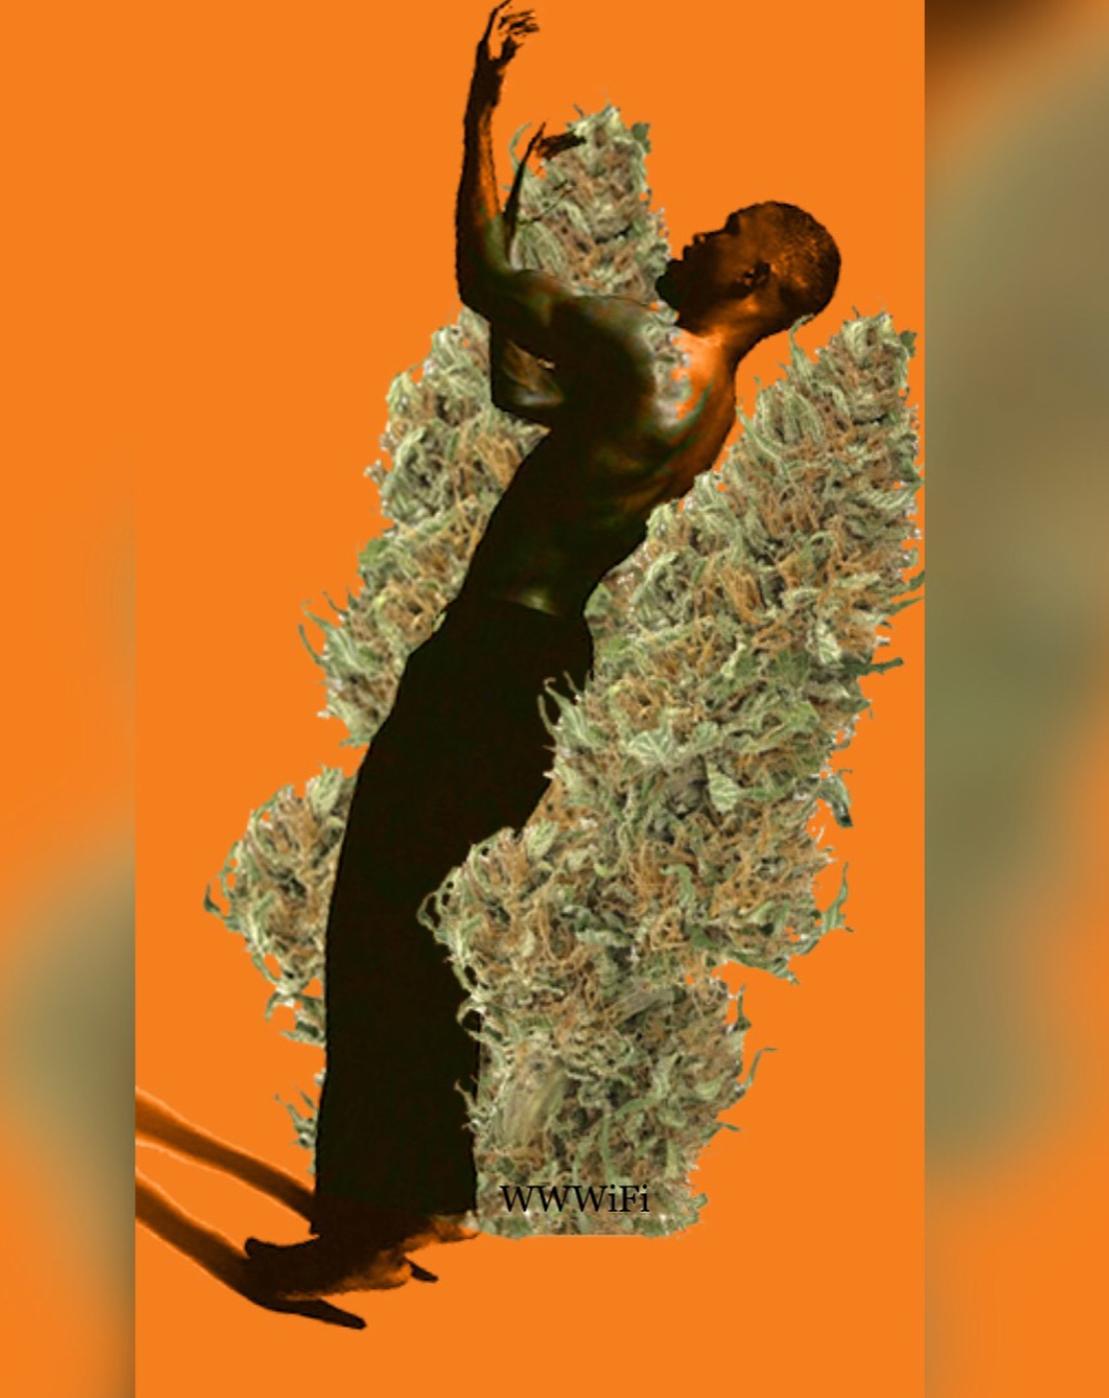 Review: Tangerine Dream